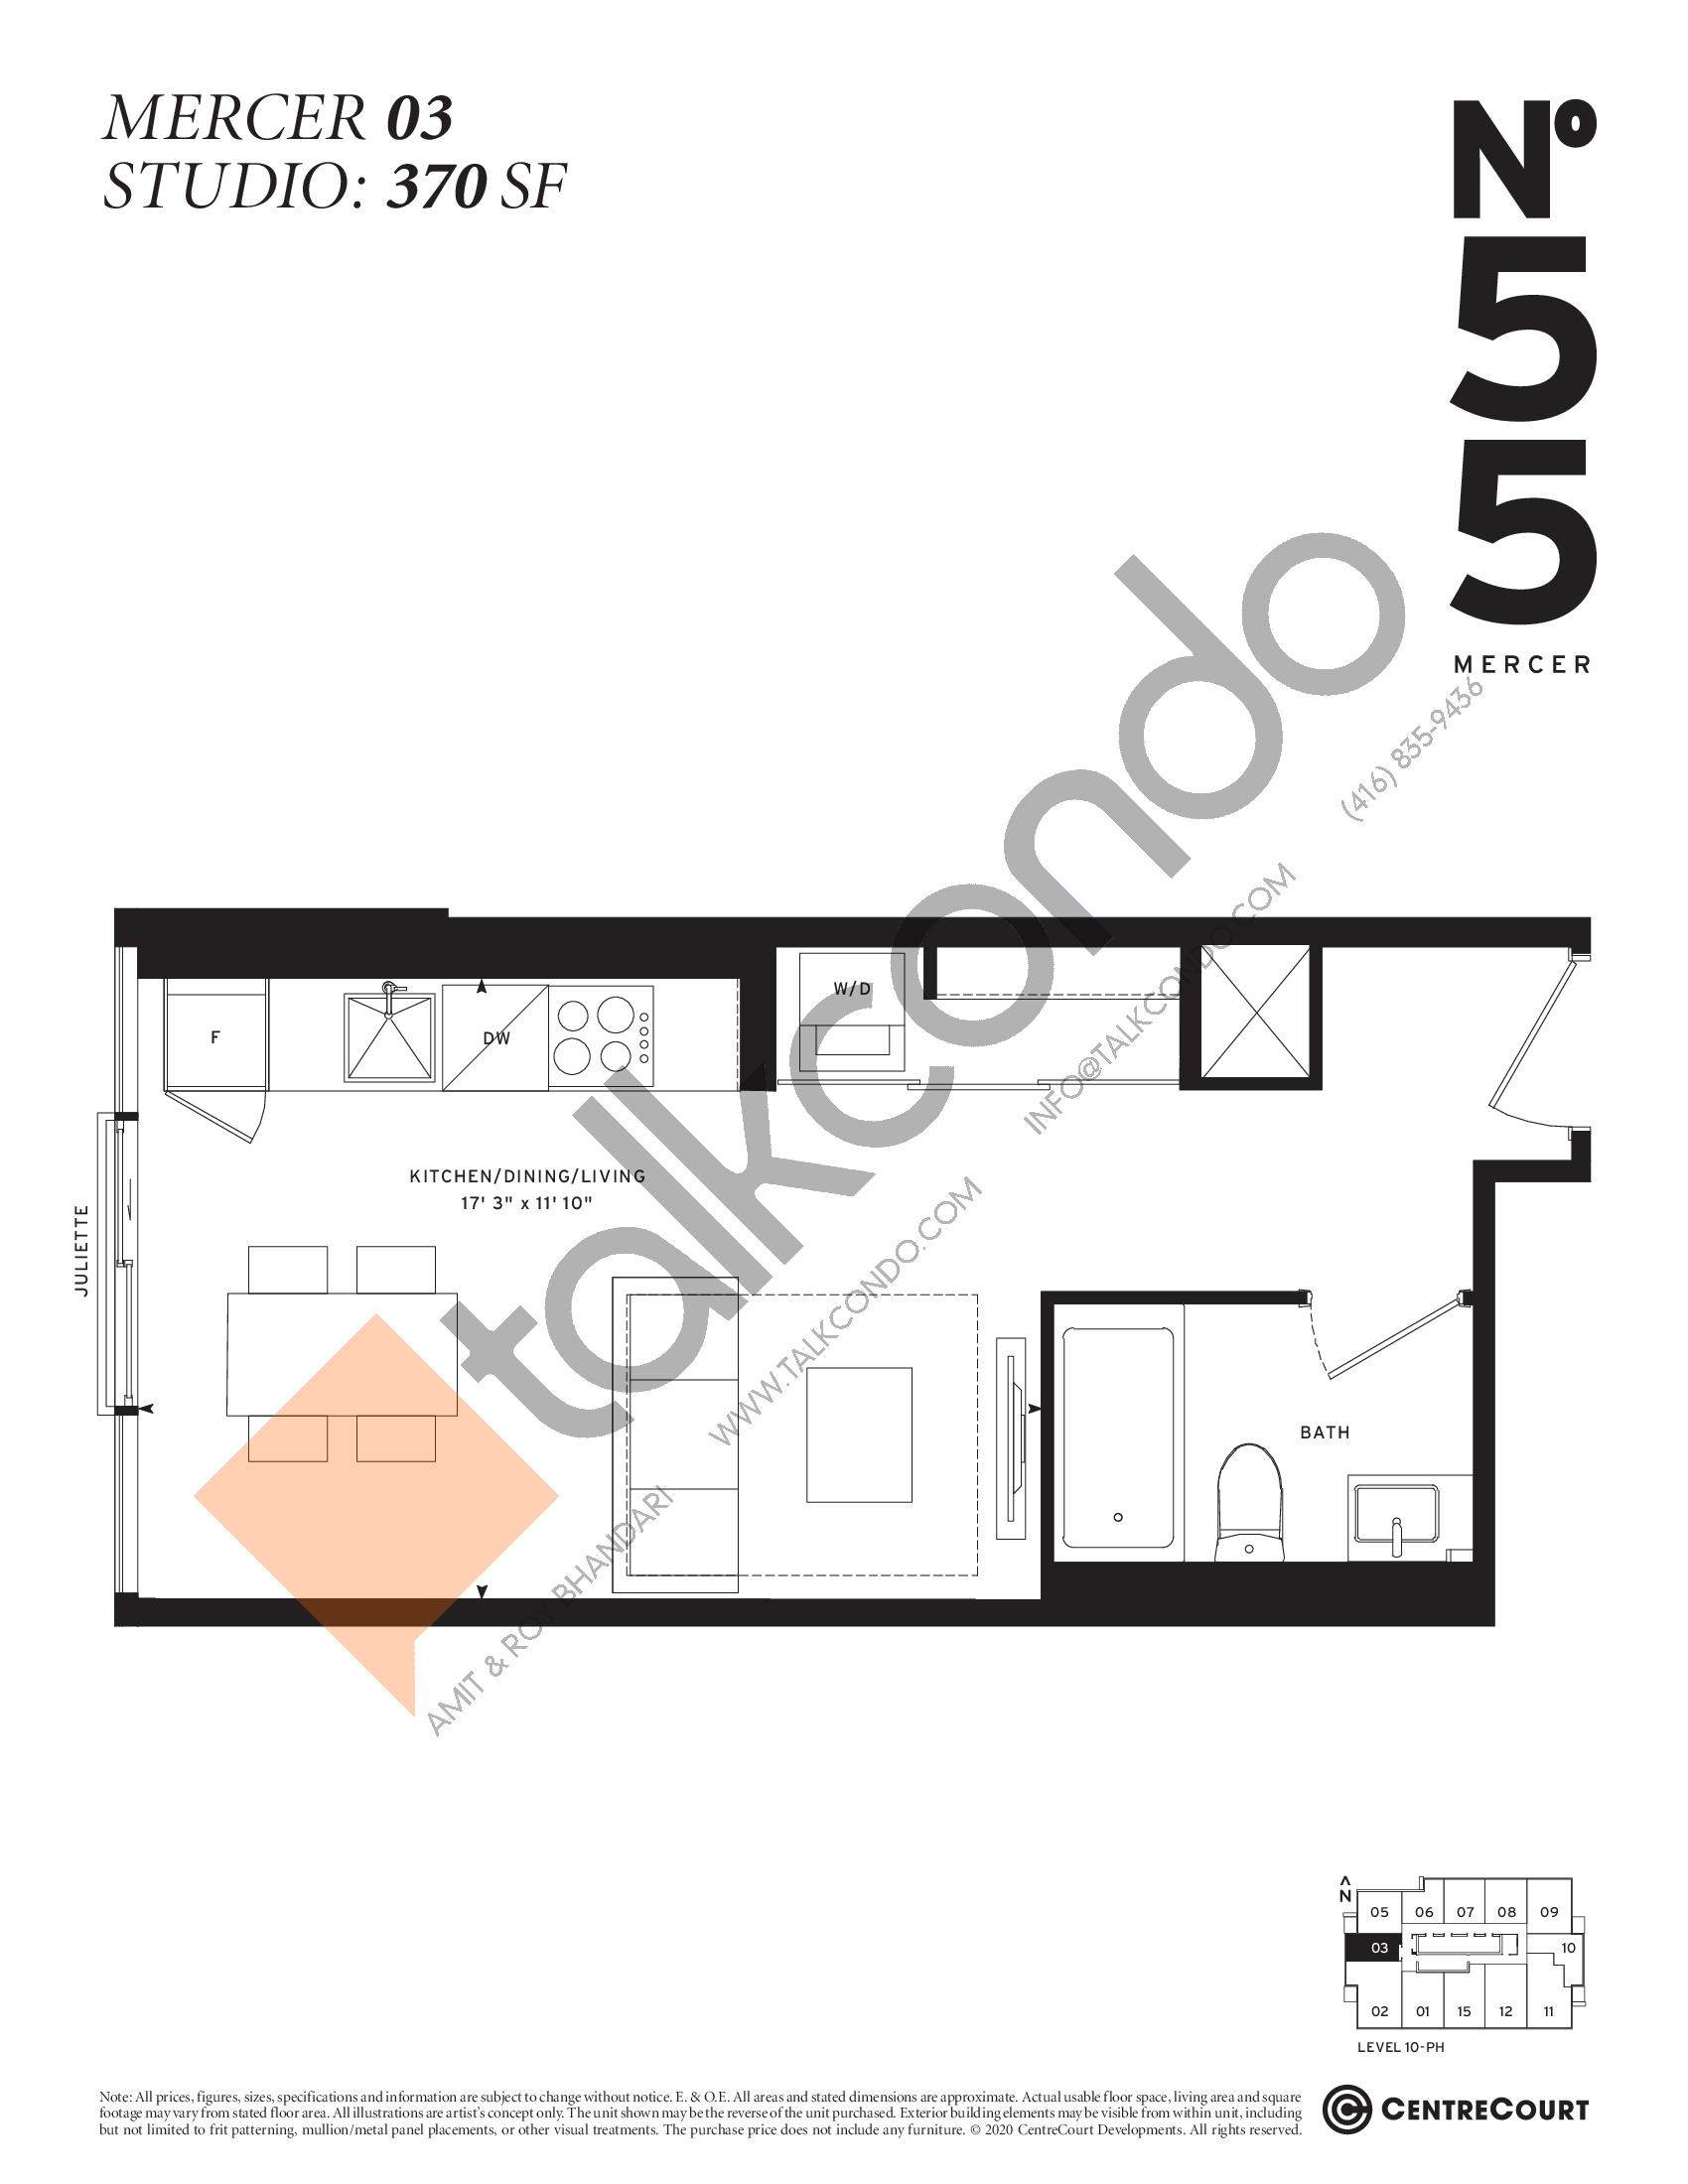 Mercer 03 Floor Plan at No. 55 Mercer Condos - 370 sq.ft